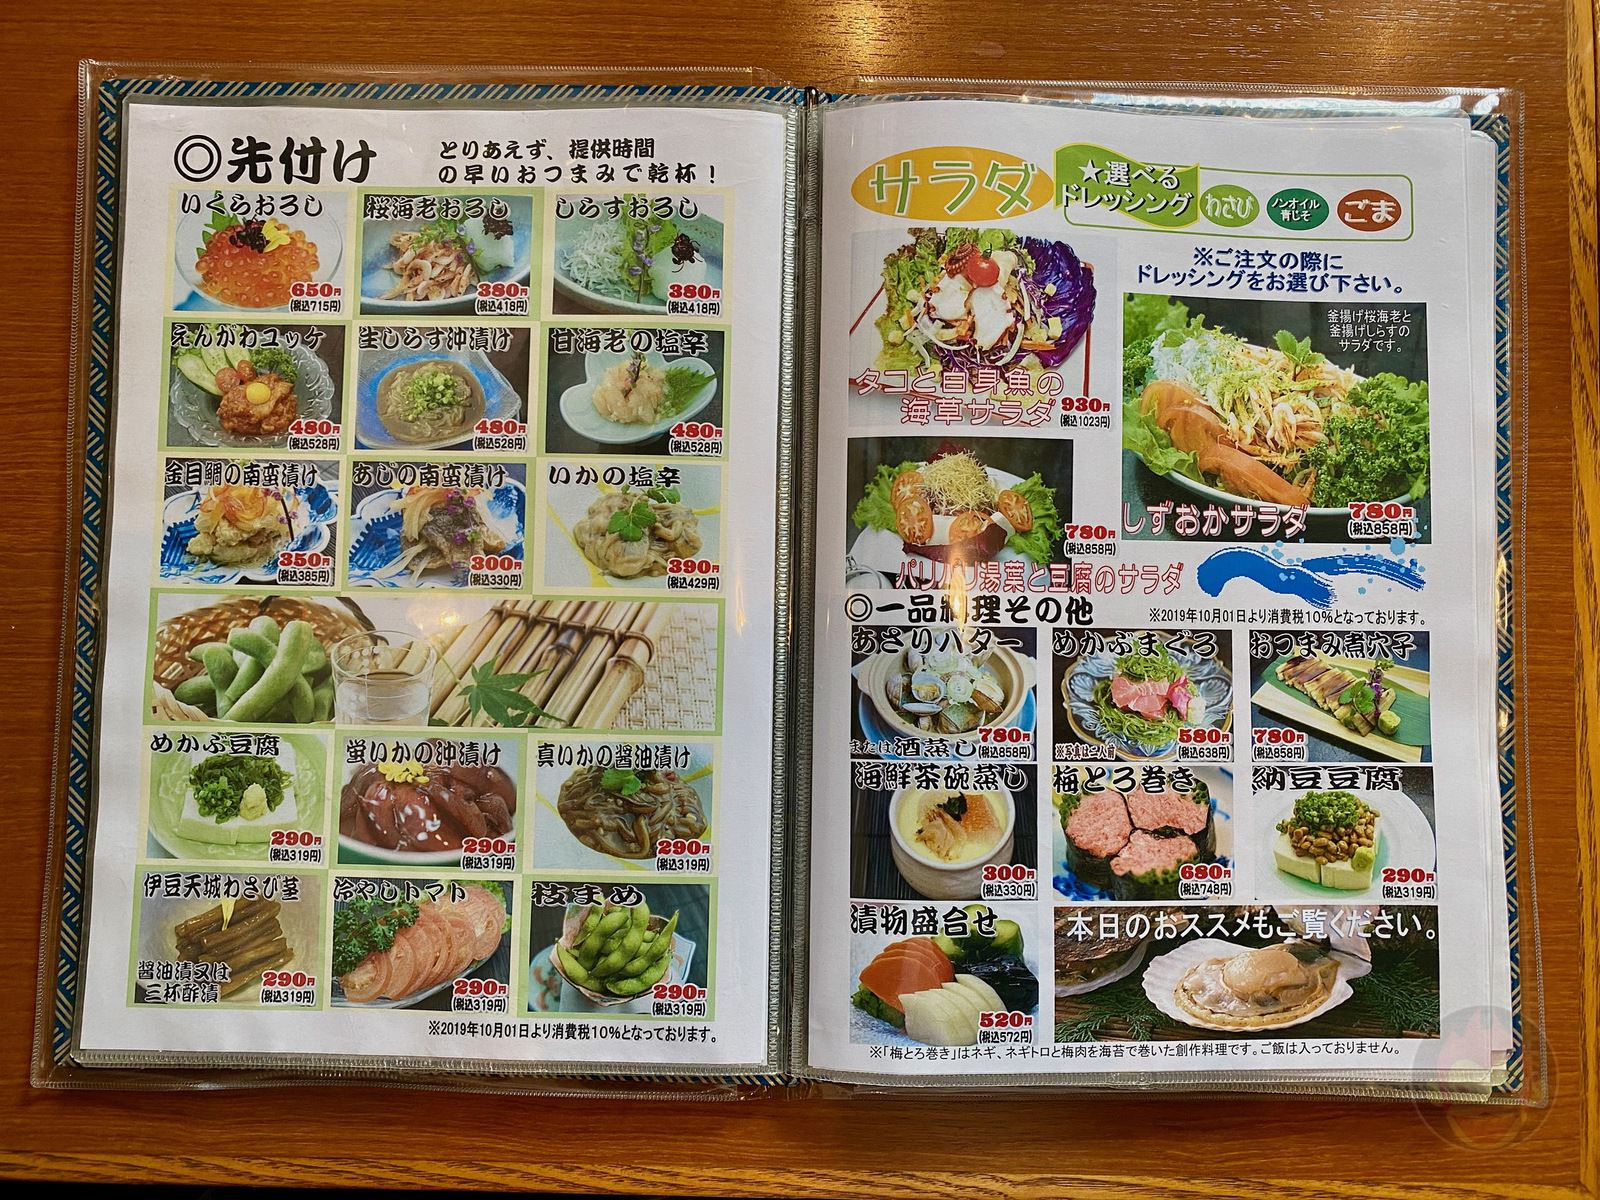 KitoKito-Atami-20.jpeg